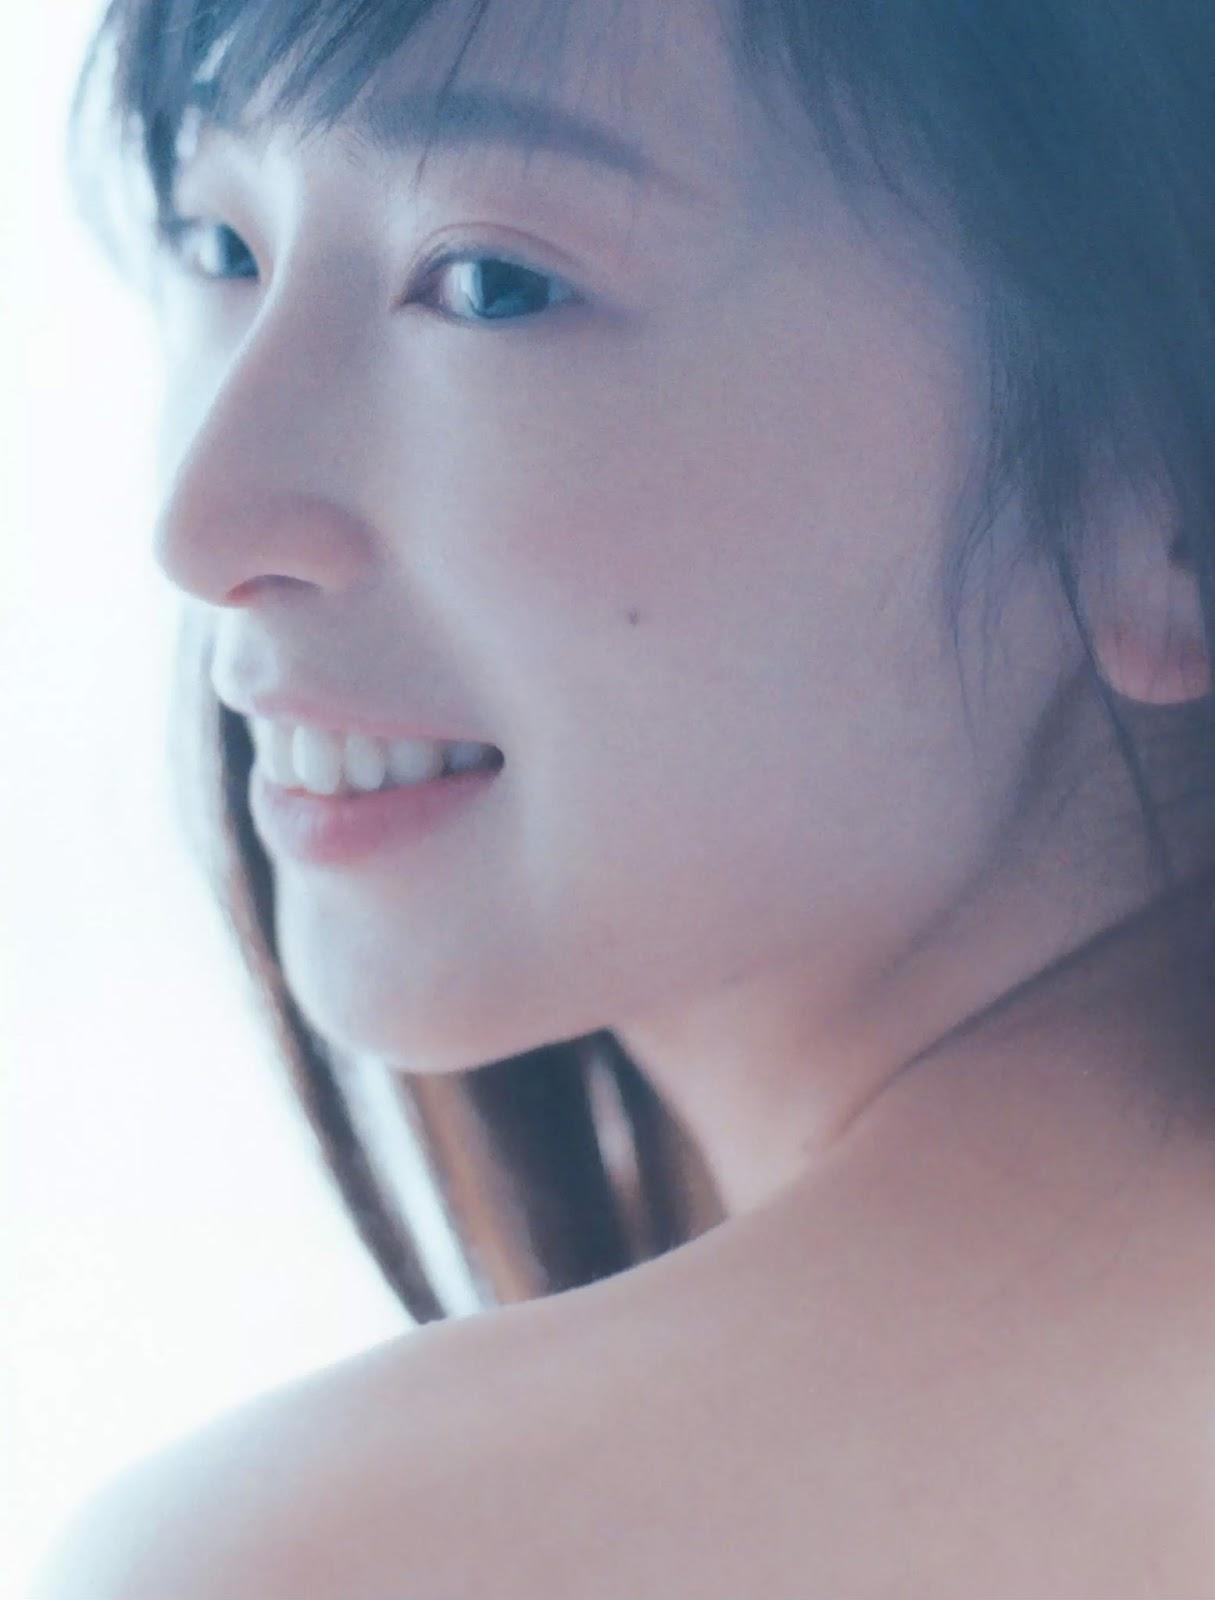 Oya Masana 大矢真那, FLASH 2018.04.17 (フラッシュ 2018年4月17日号)